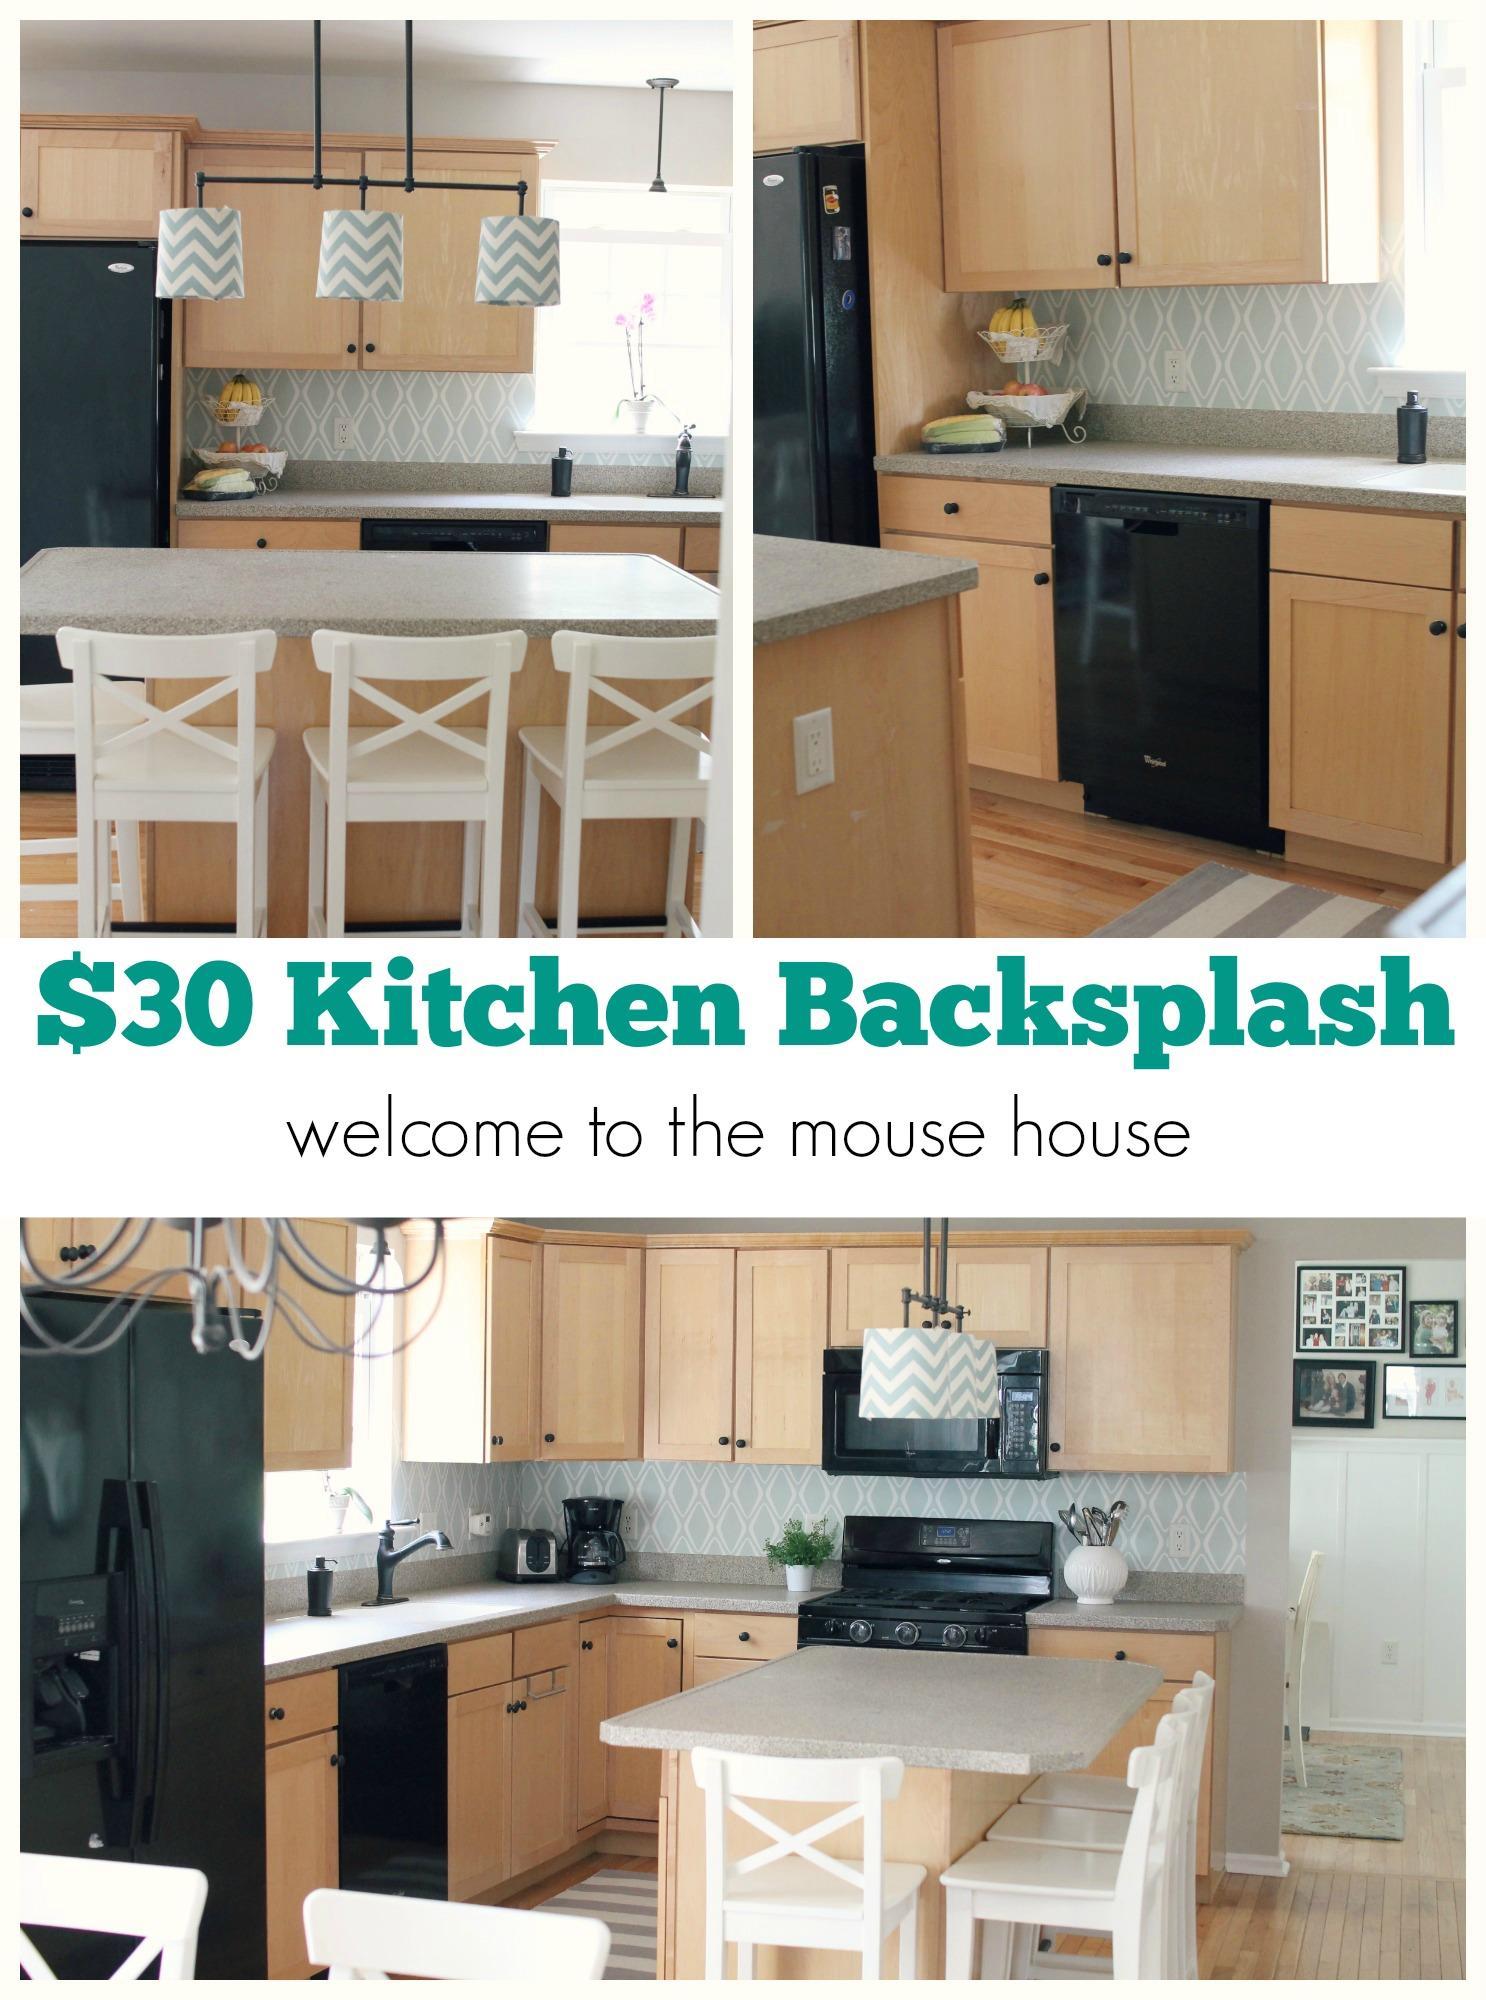 wallpaper kitchen backsplash granite table easy 30 target